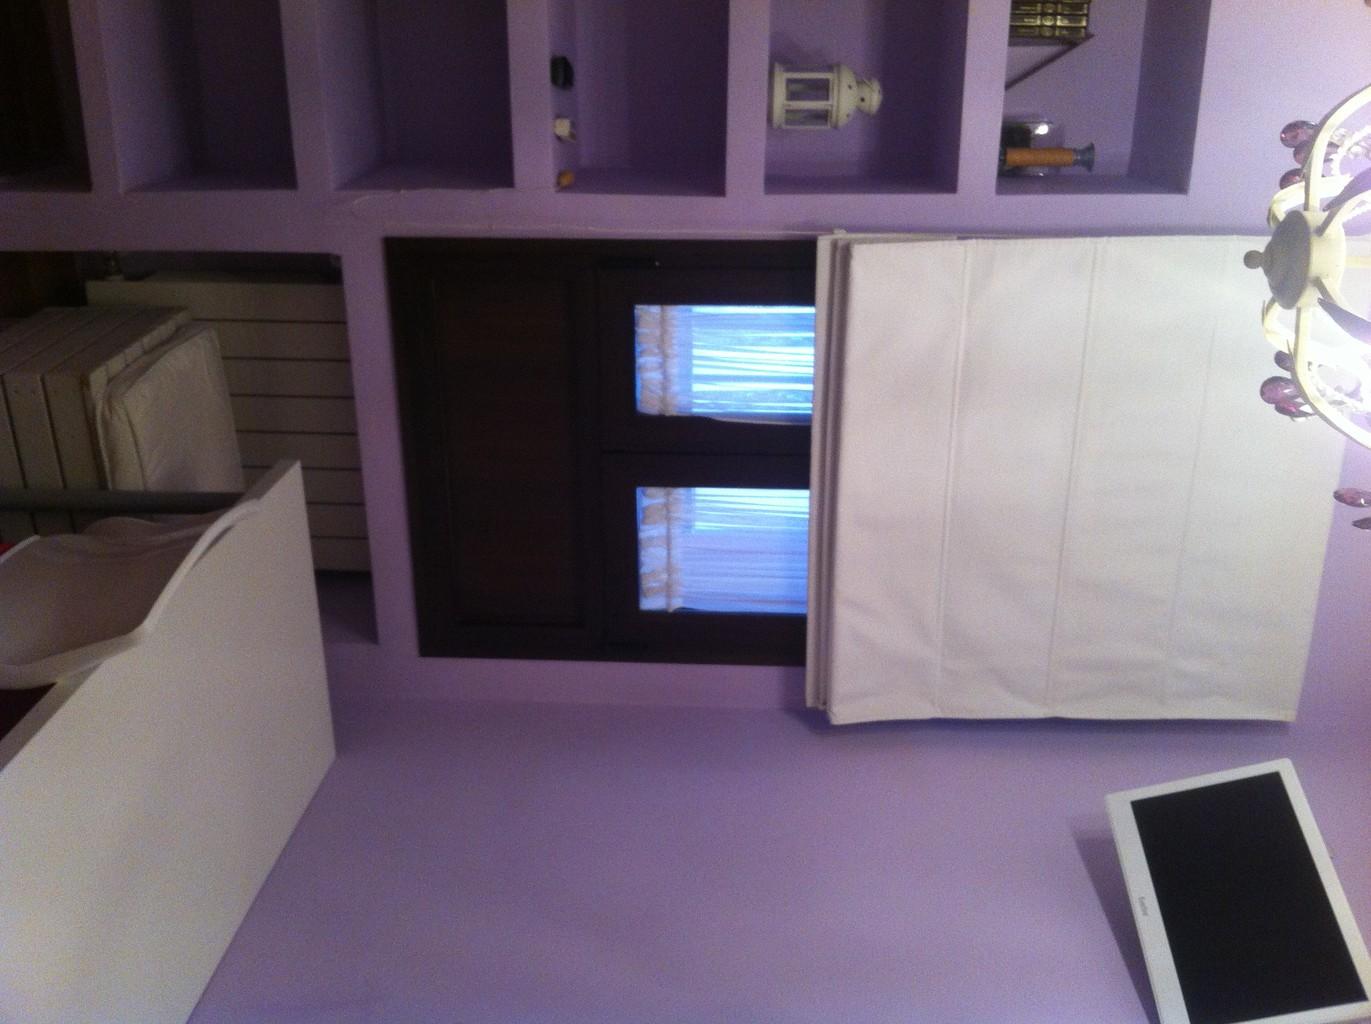 Habitacion estudio alquiler estudios sevilla for Piso estudio sevilla